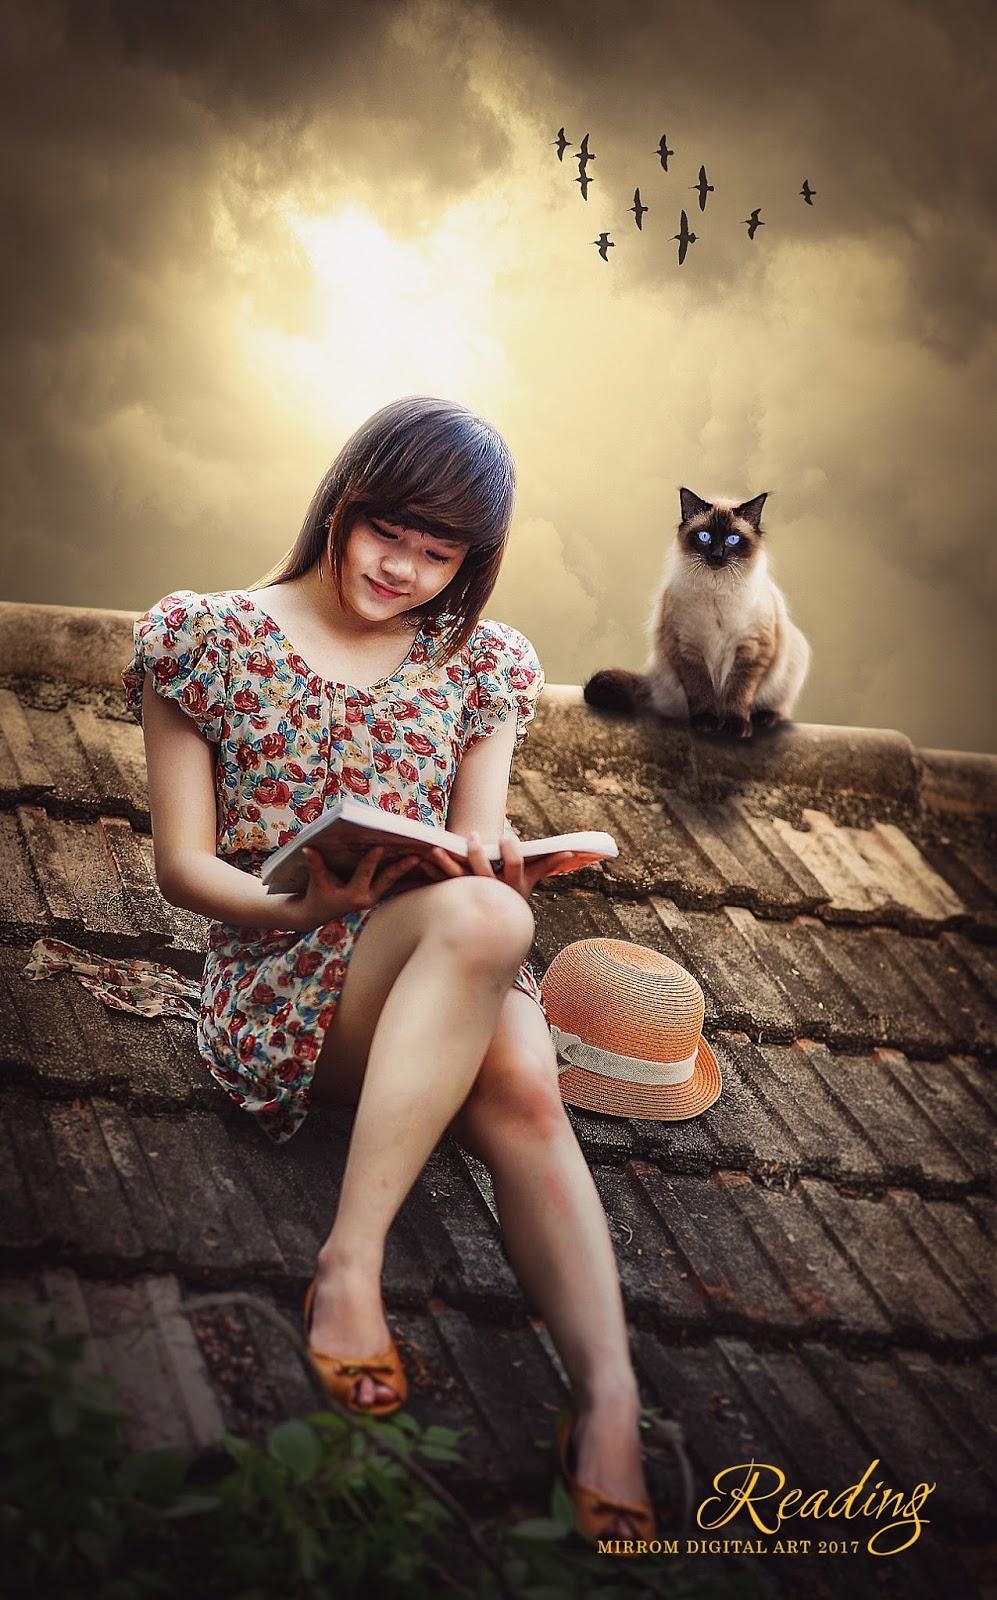 Create an Beautiful Portrait Photo Manipulation With Photoshop